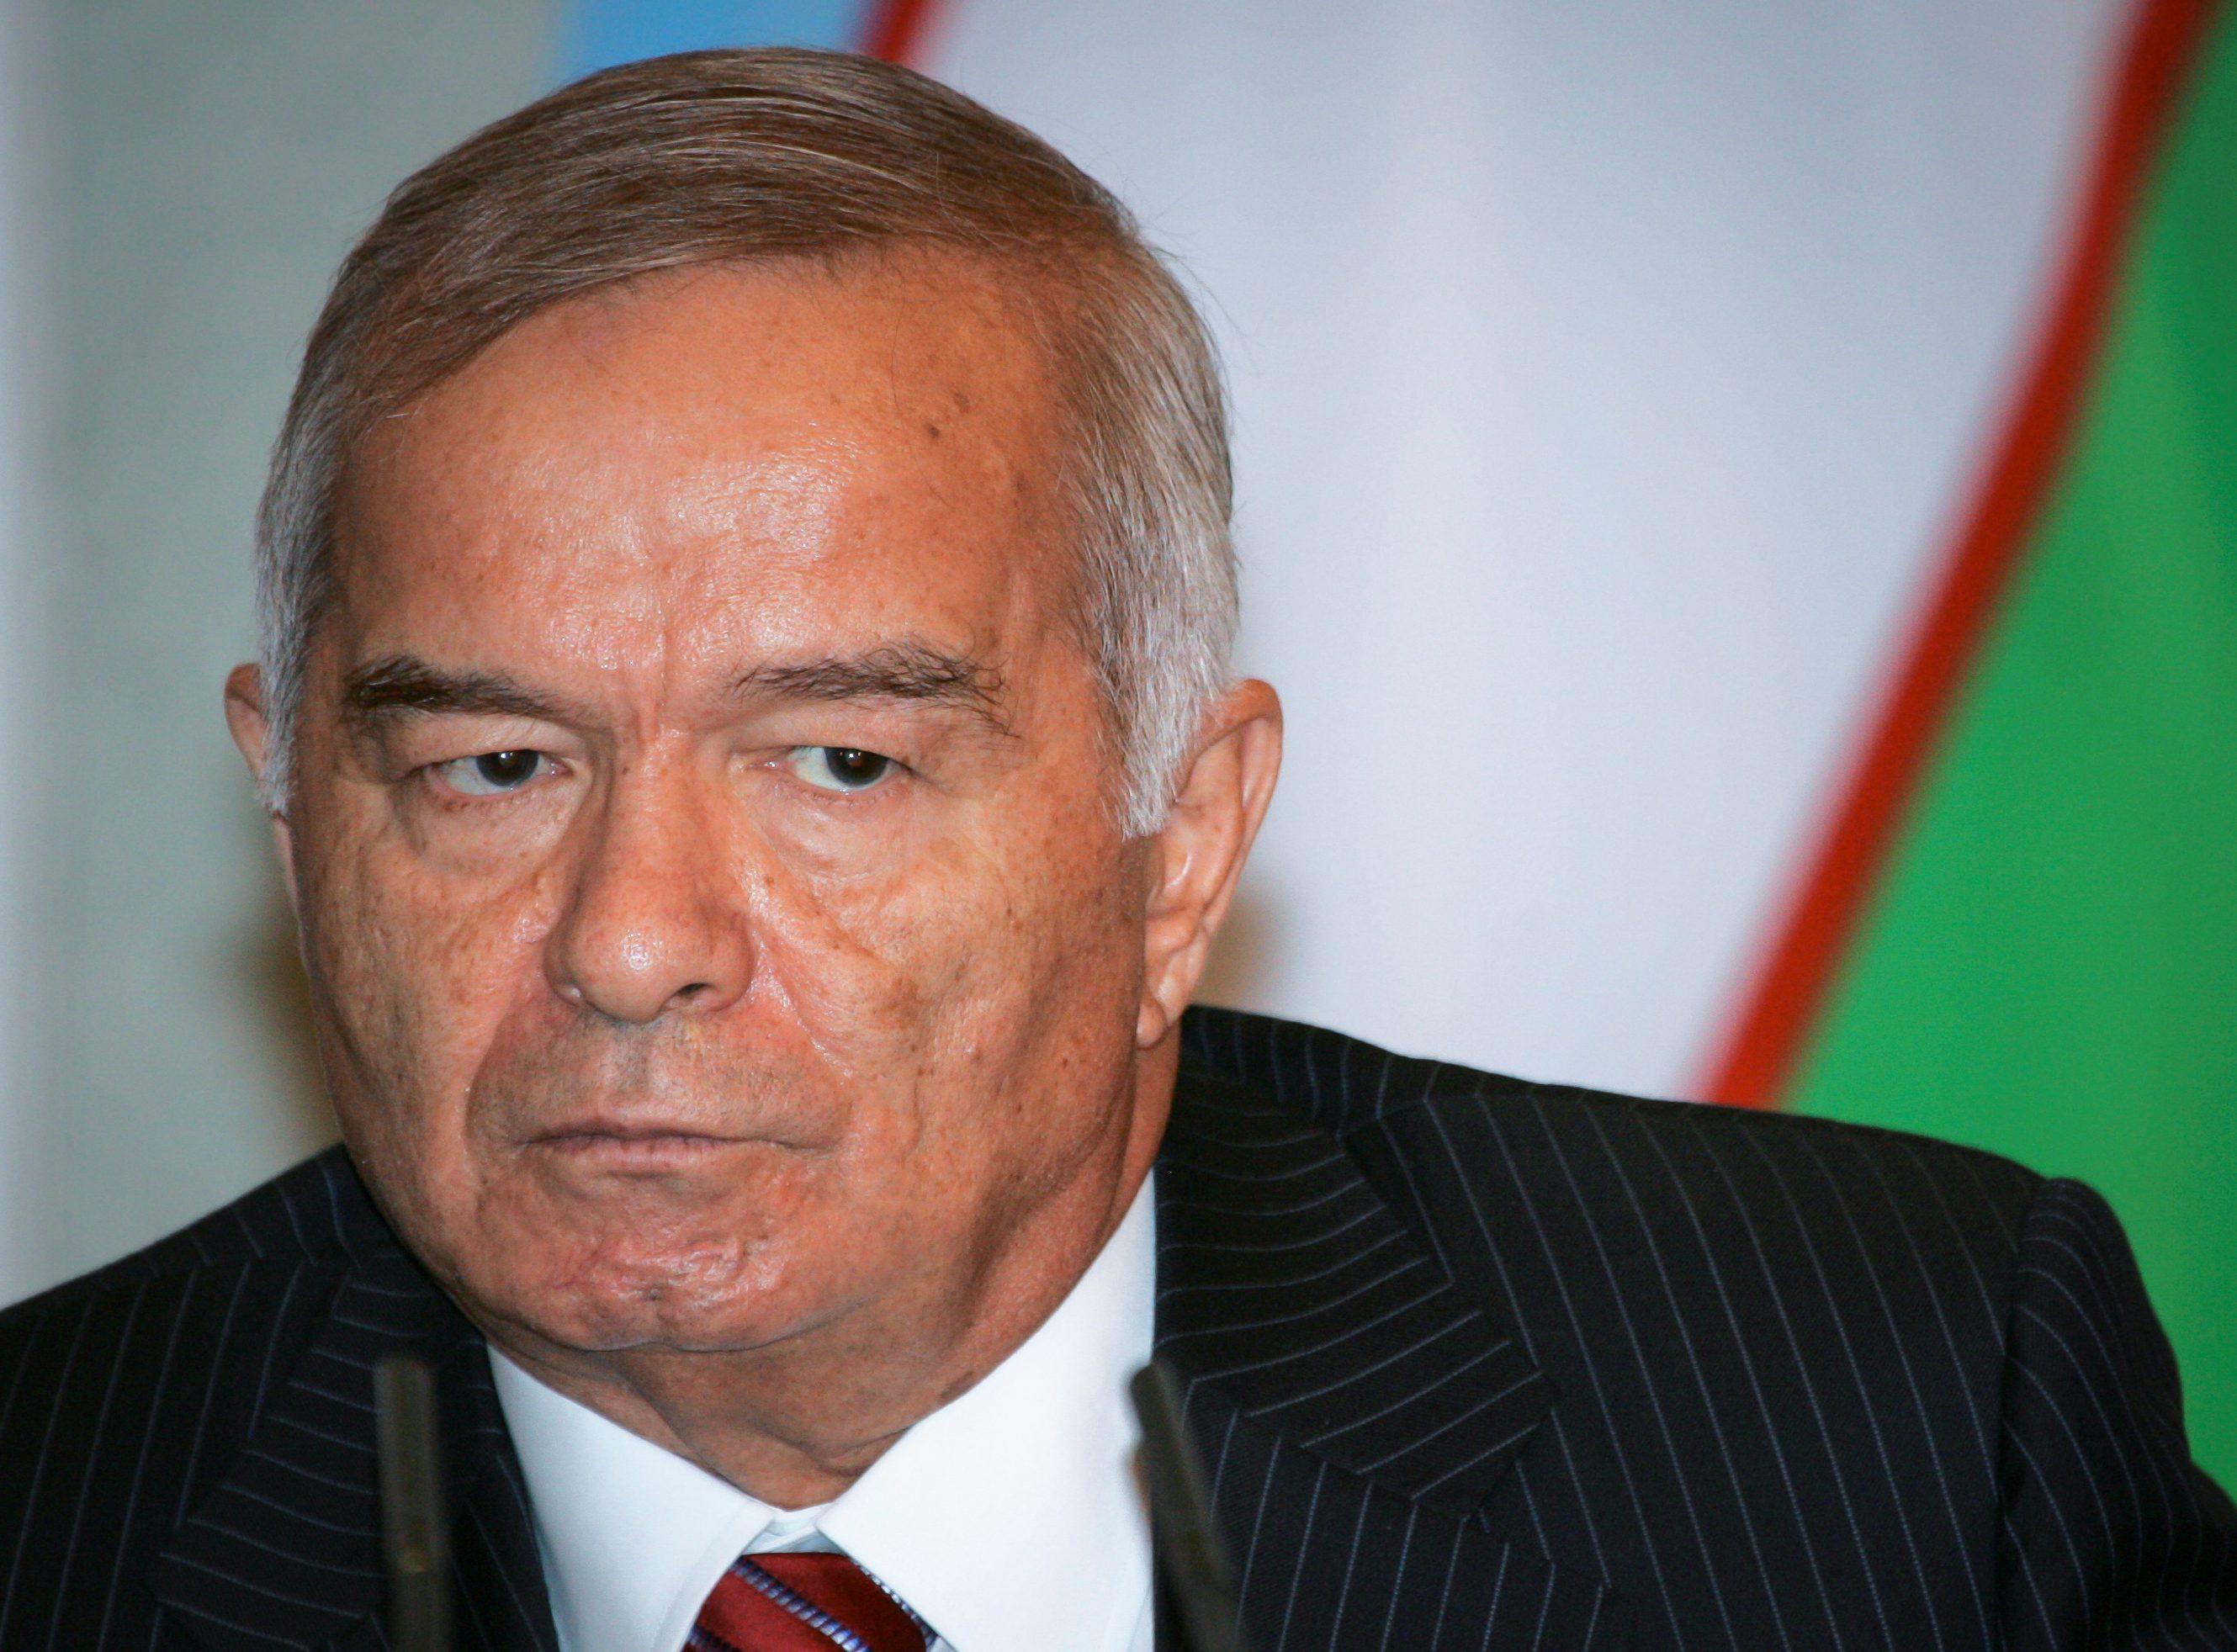 Uzbekistan President Islam Karimov attends news conference in Tashkent.